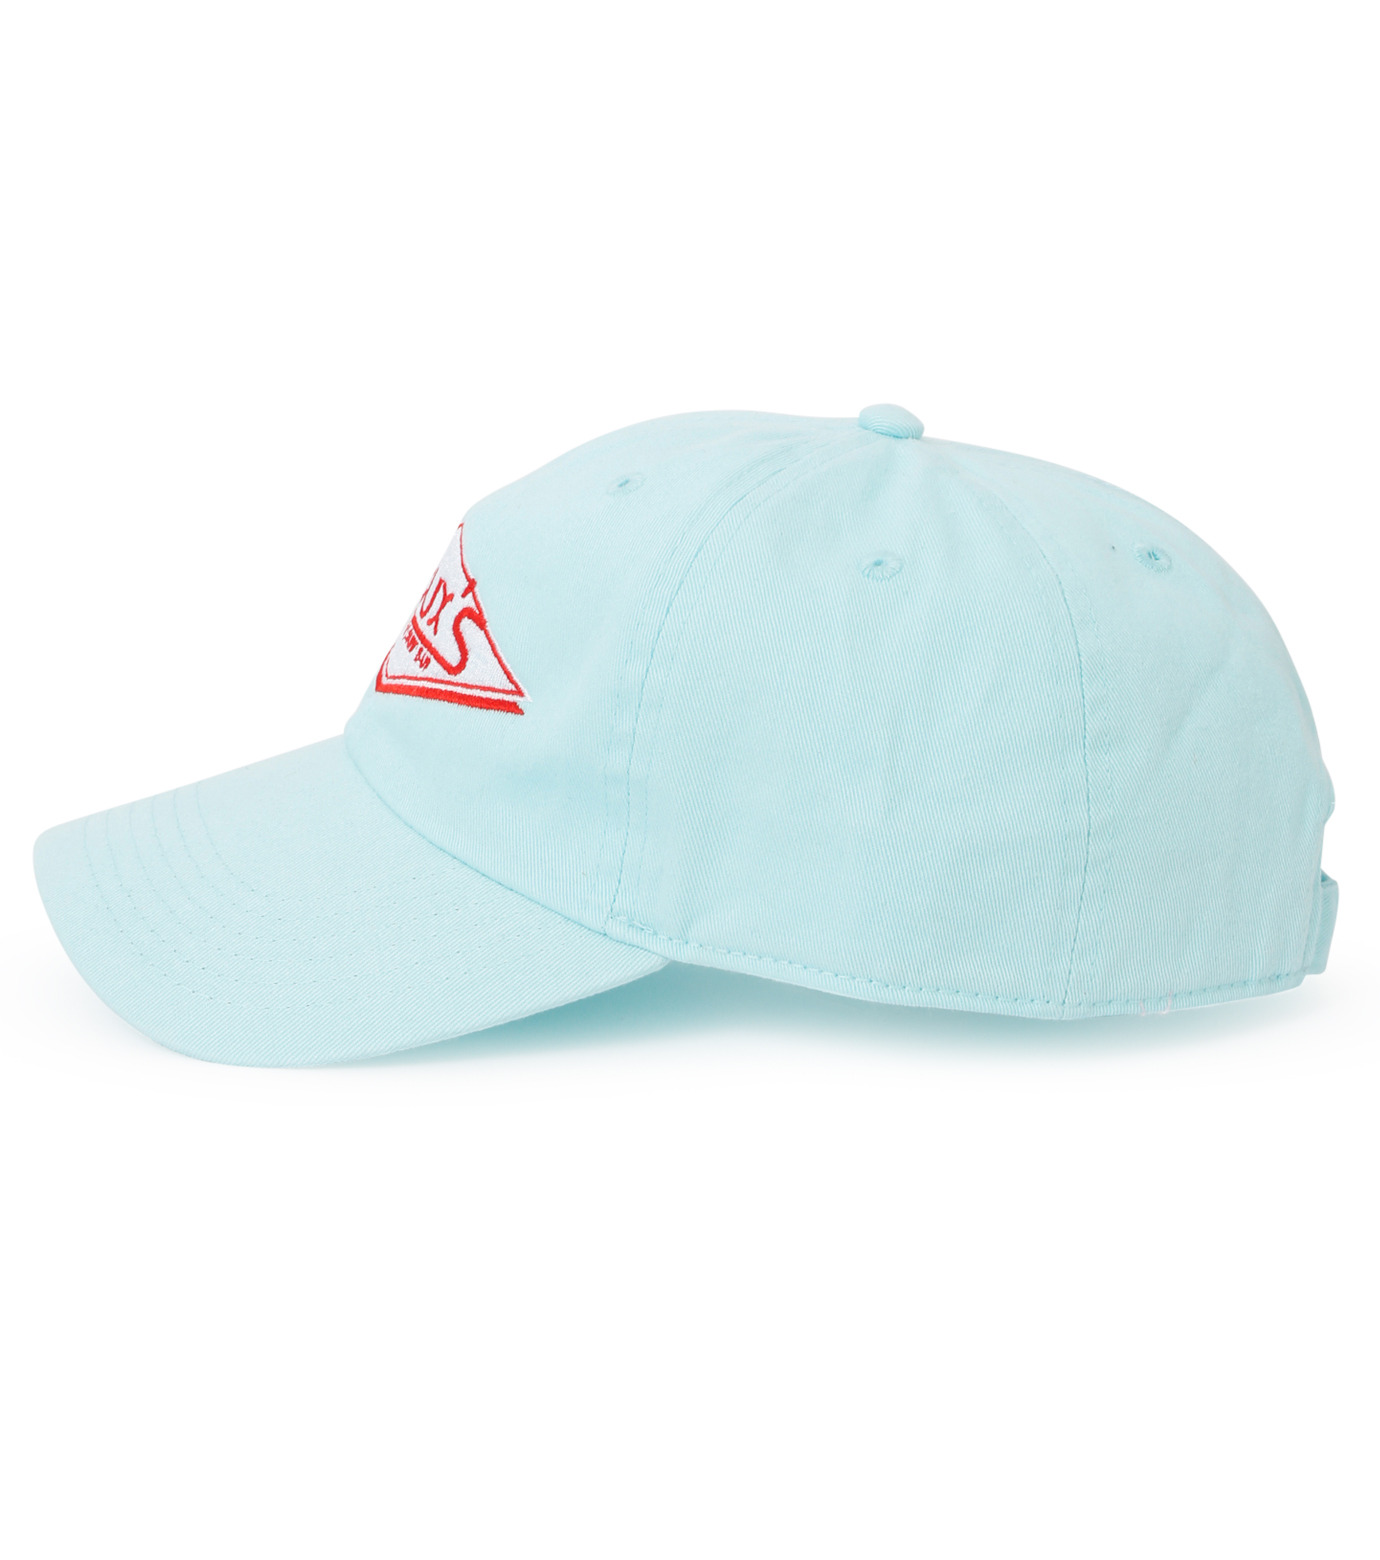 HEY YOU !(ヘイユウ)のDEUX'S CAP-LIGHT BLUE(キャップ/cap)-18S90021-91 拡大詳細画像2